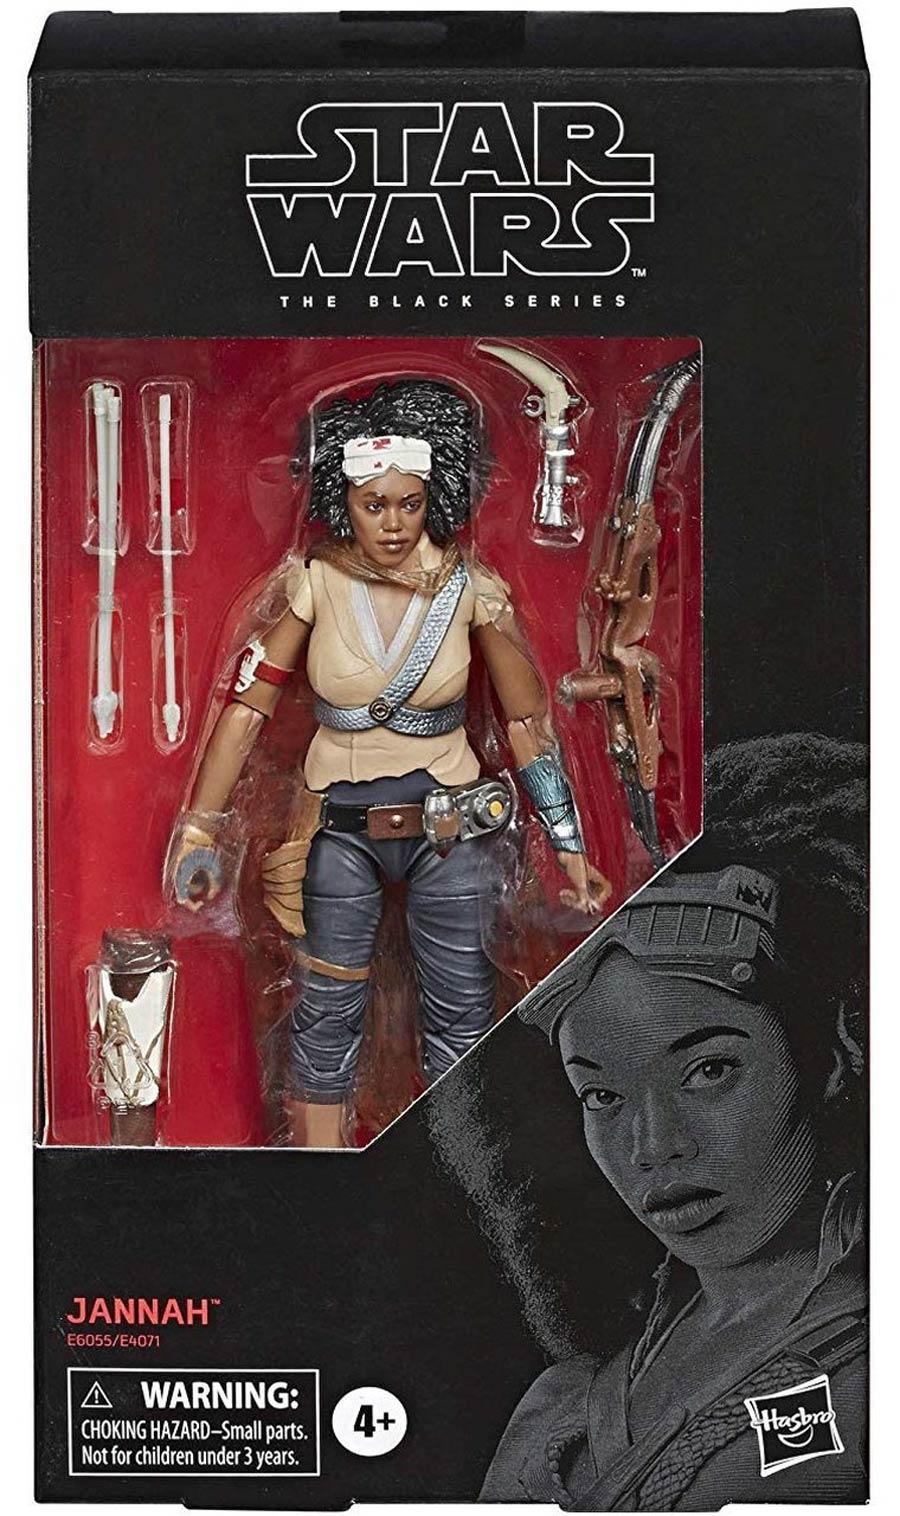 Star Wars Black Series 6-Inch Action Figure #98 Jannah